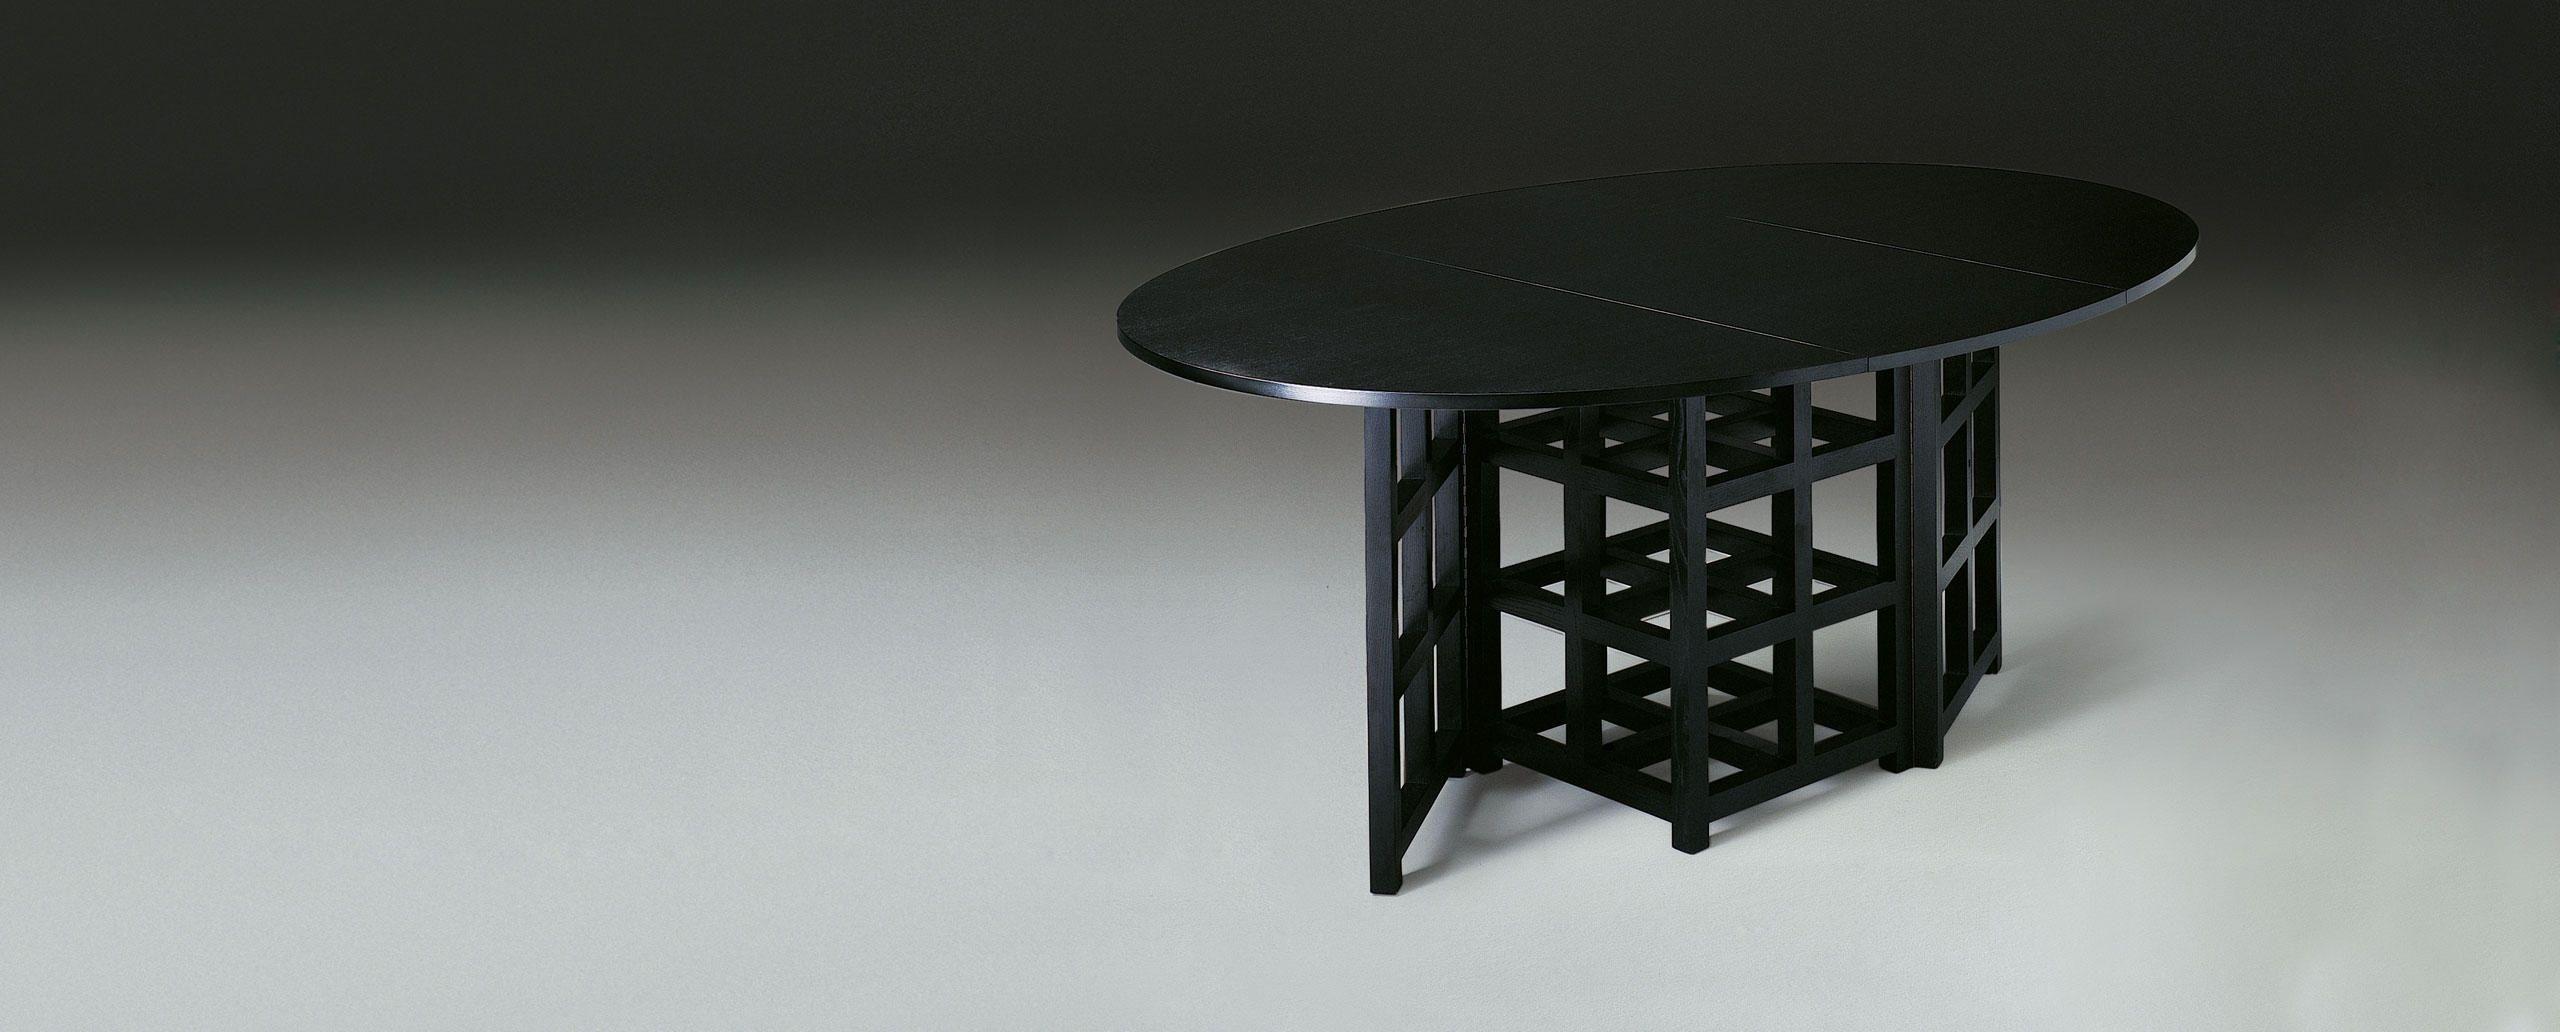 d1a09e7fd425a44978aab7eaf39f7c1b Incroyable De Table Basse Le Corbusier Concept